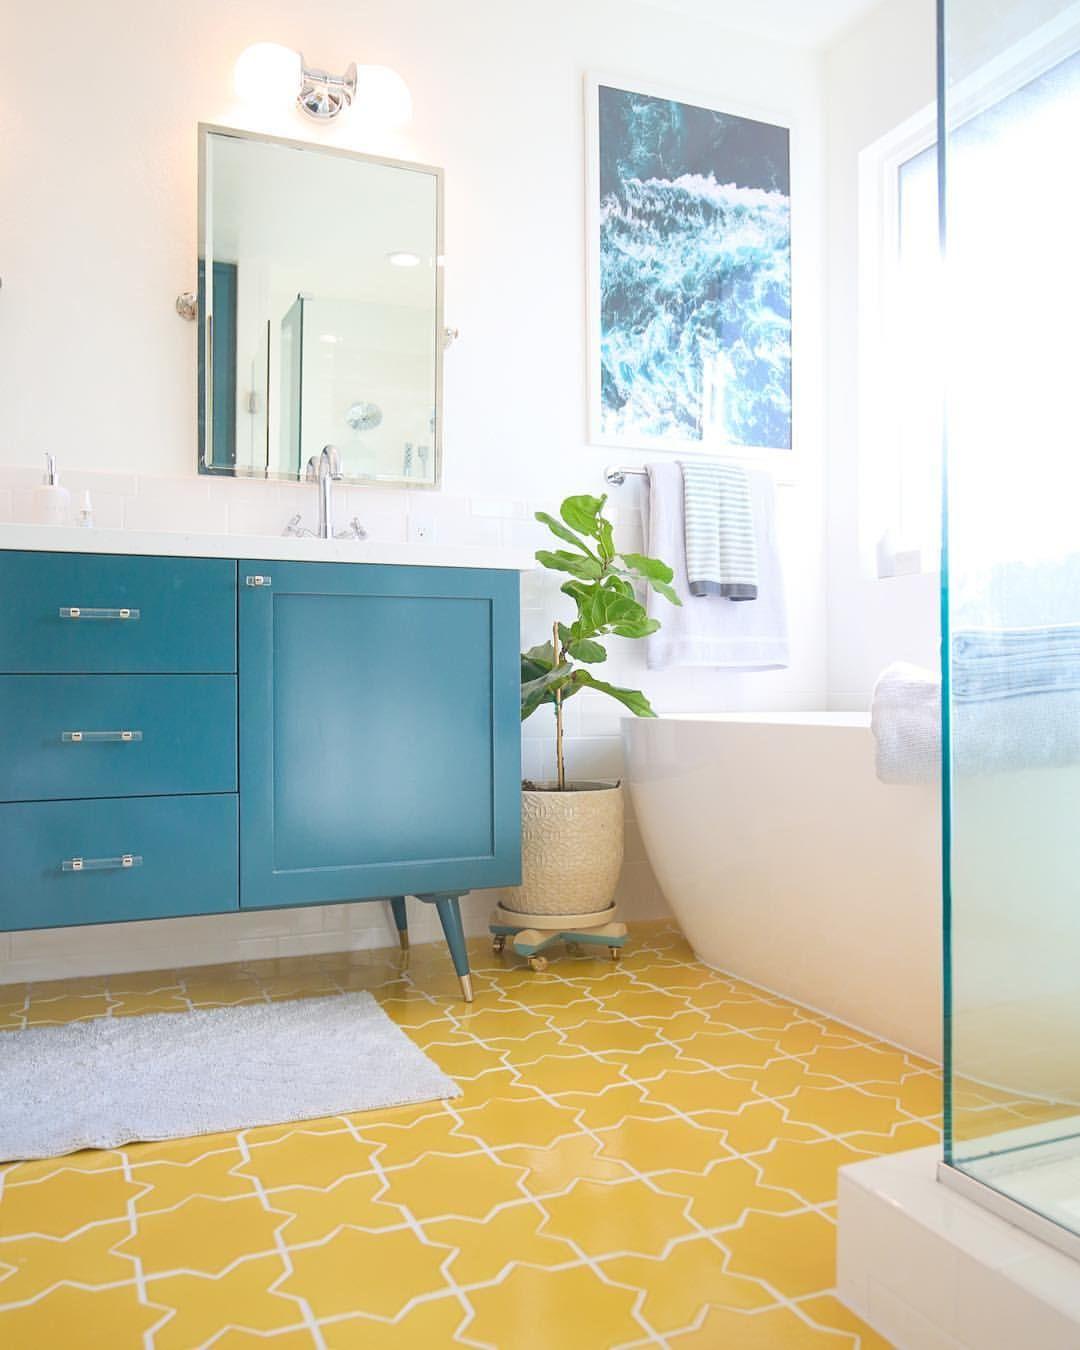 Teal Bathroom Vanity And Yellow Tile Floor Interior Vegger Design